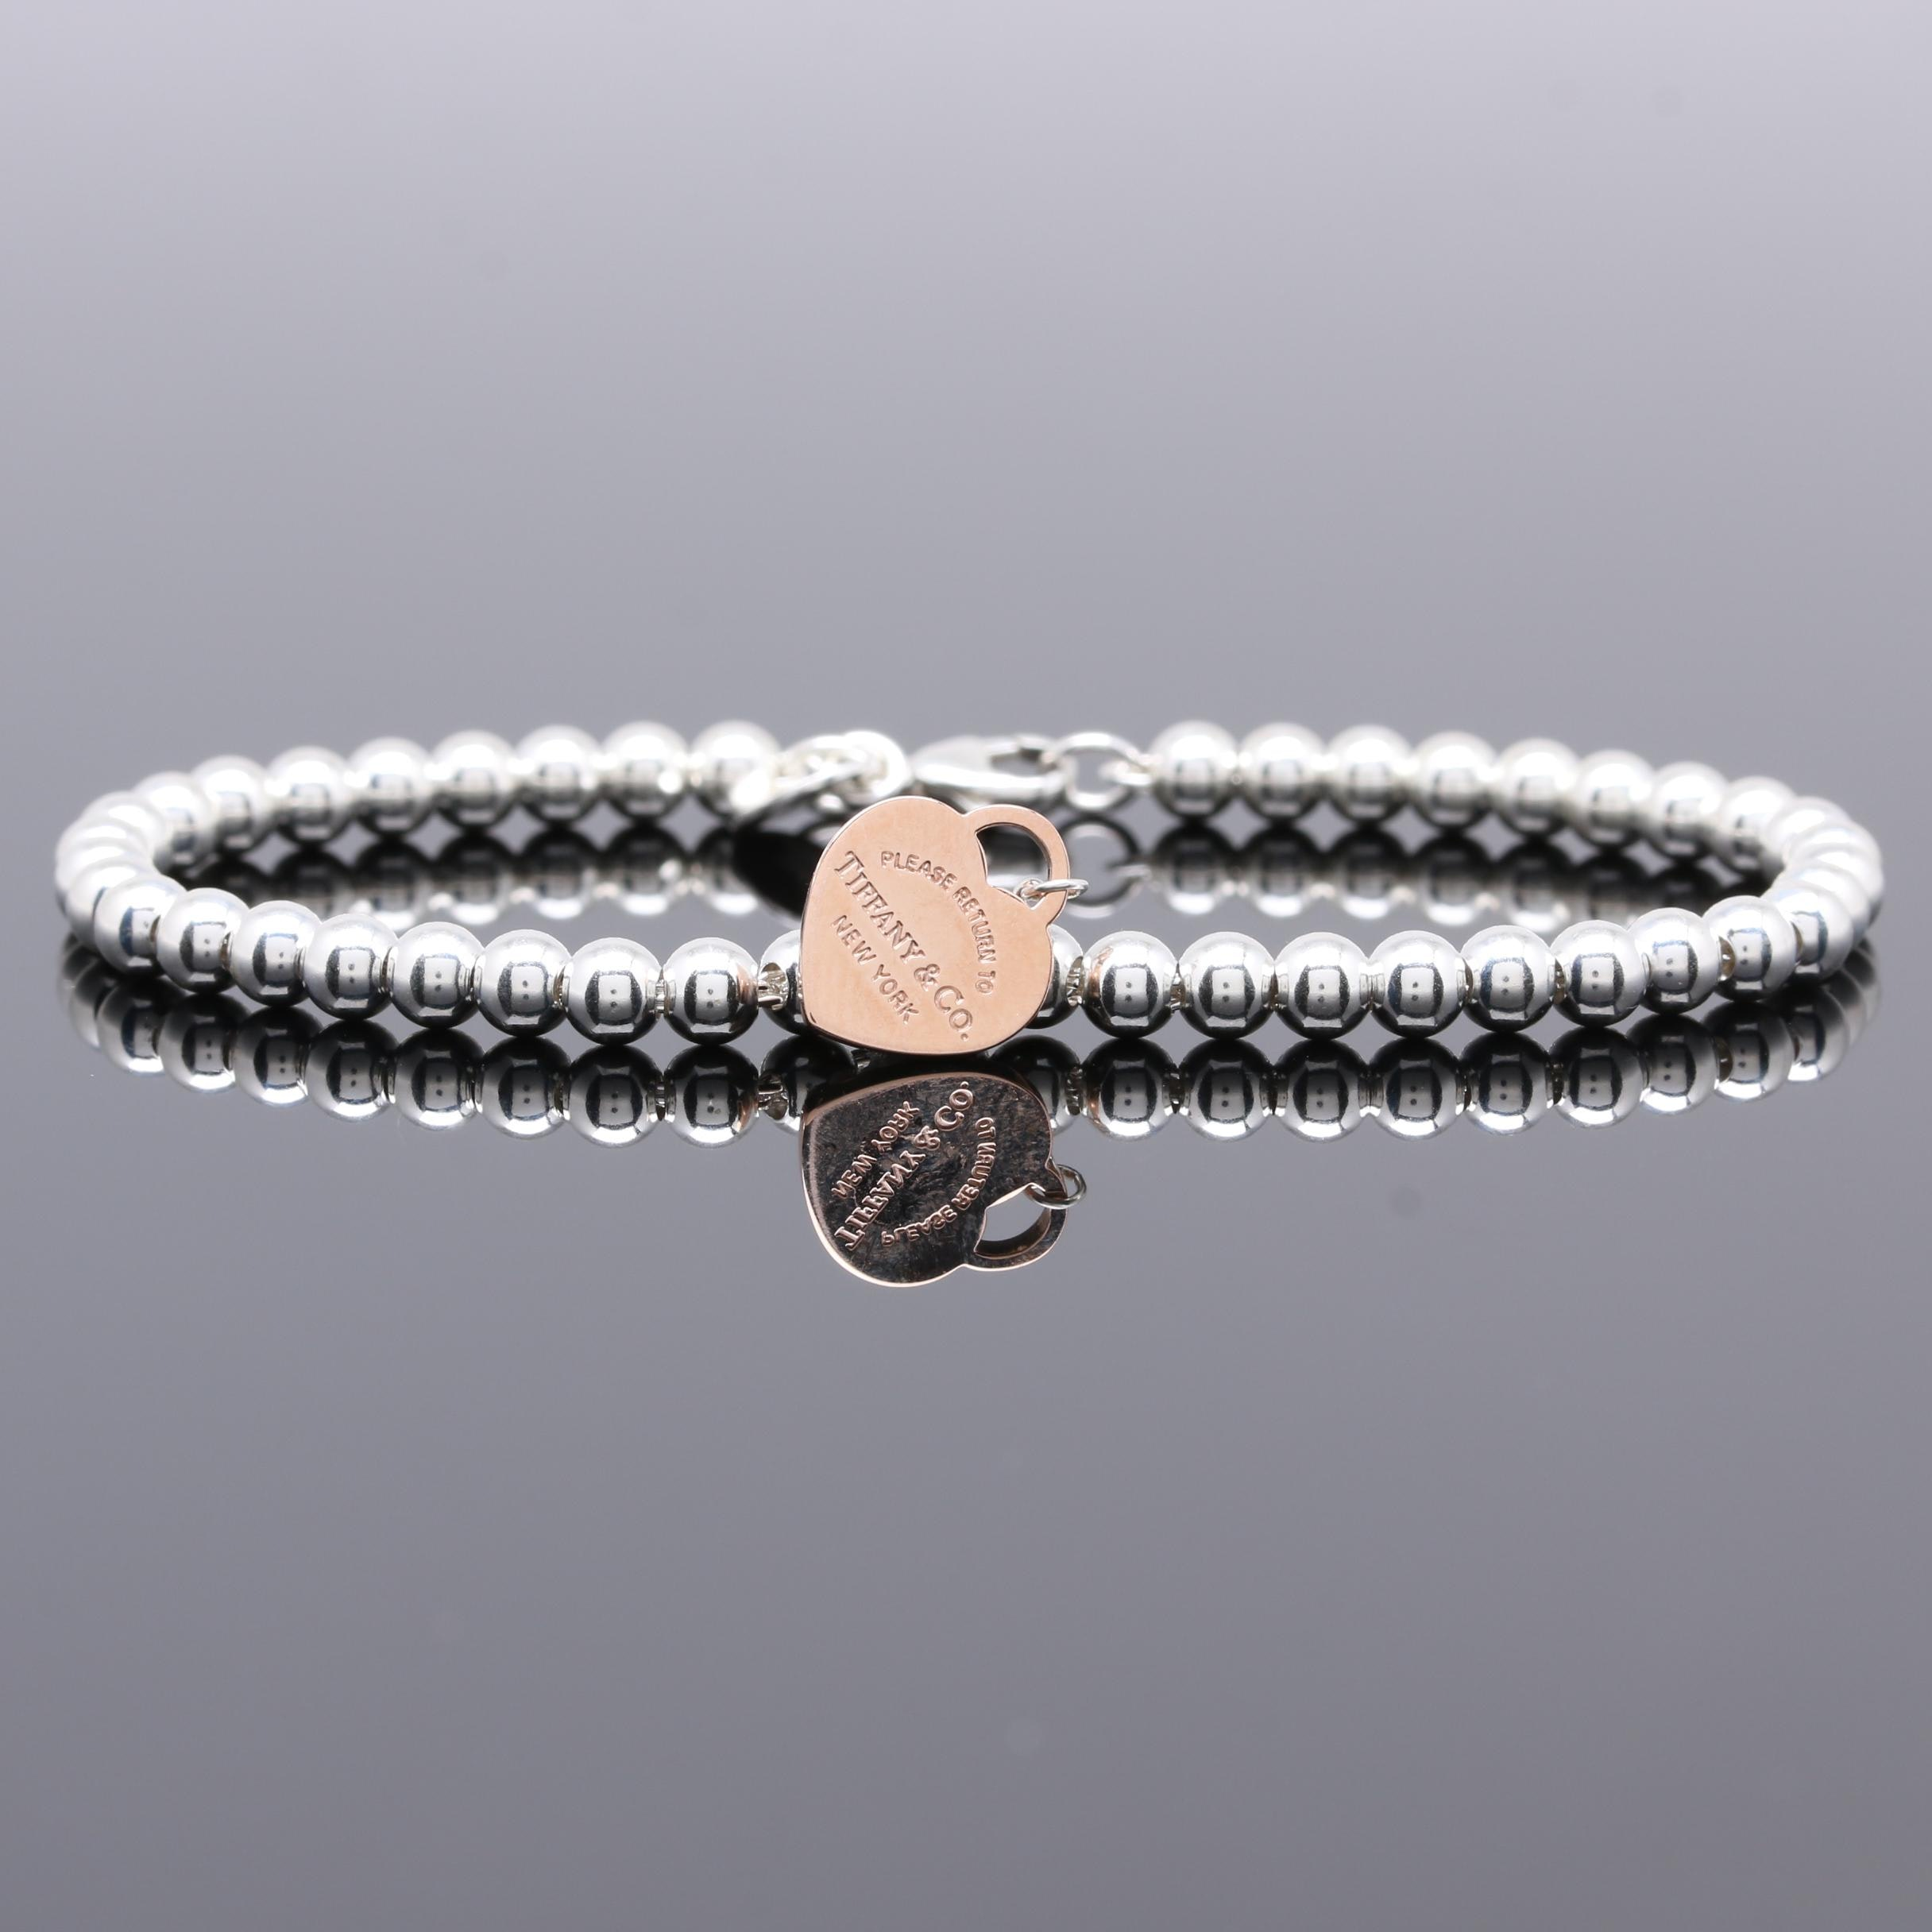 "Tiffany & Co. ""Return to Tiffany"" Sterling Silver and Rubedo® Bracelet"